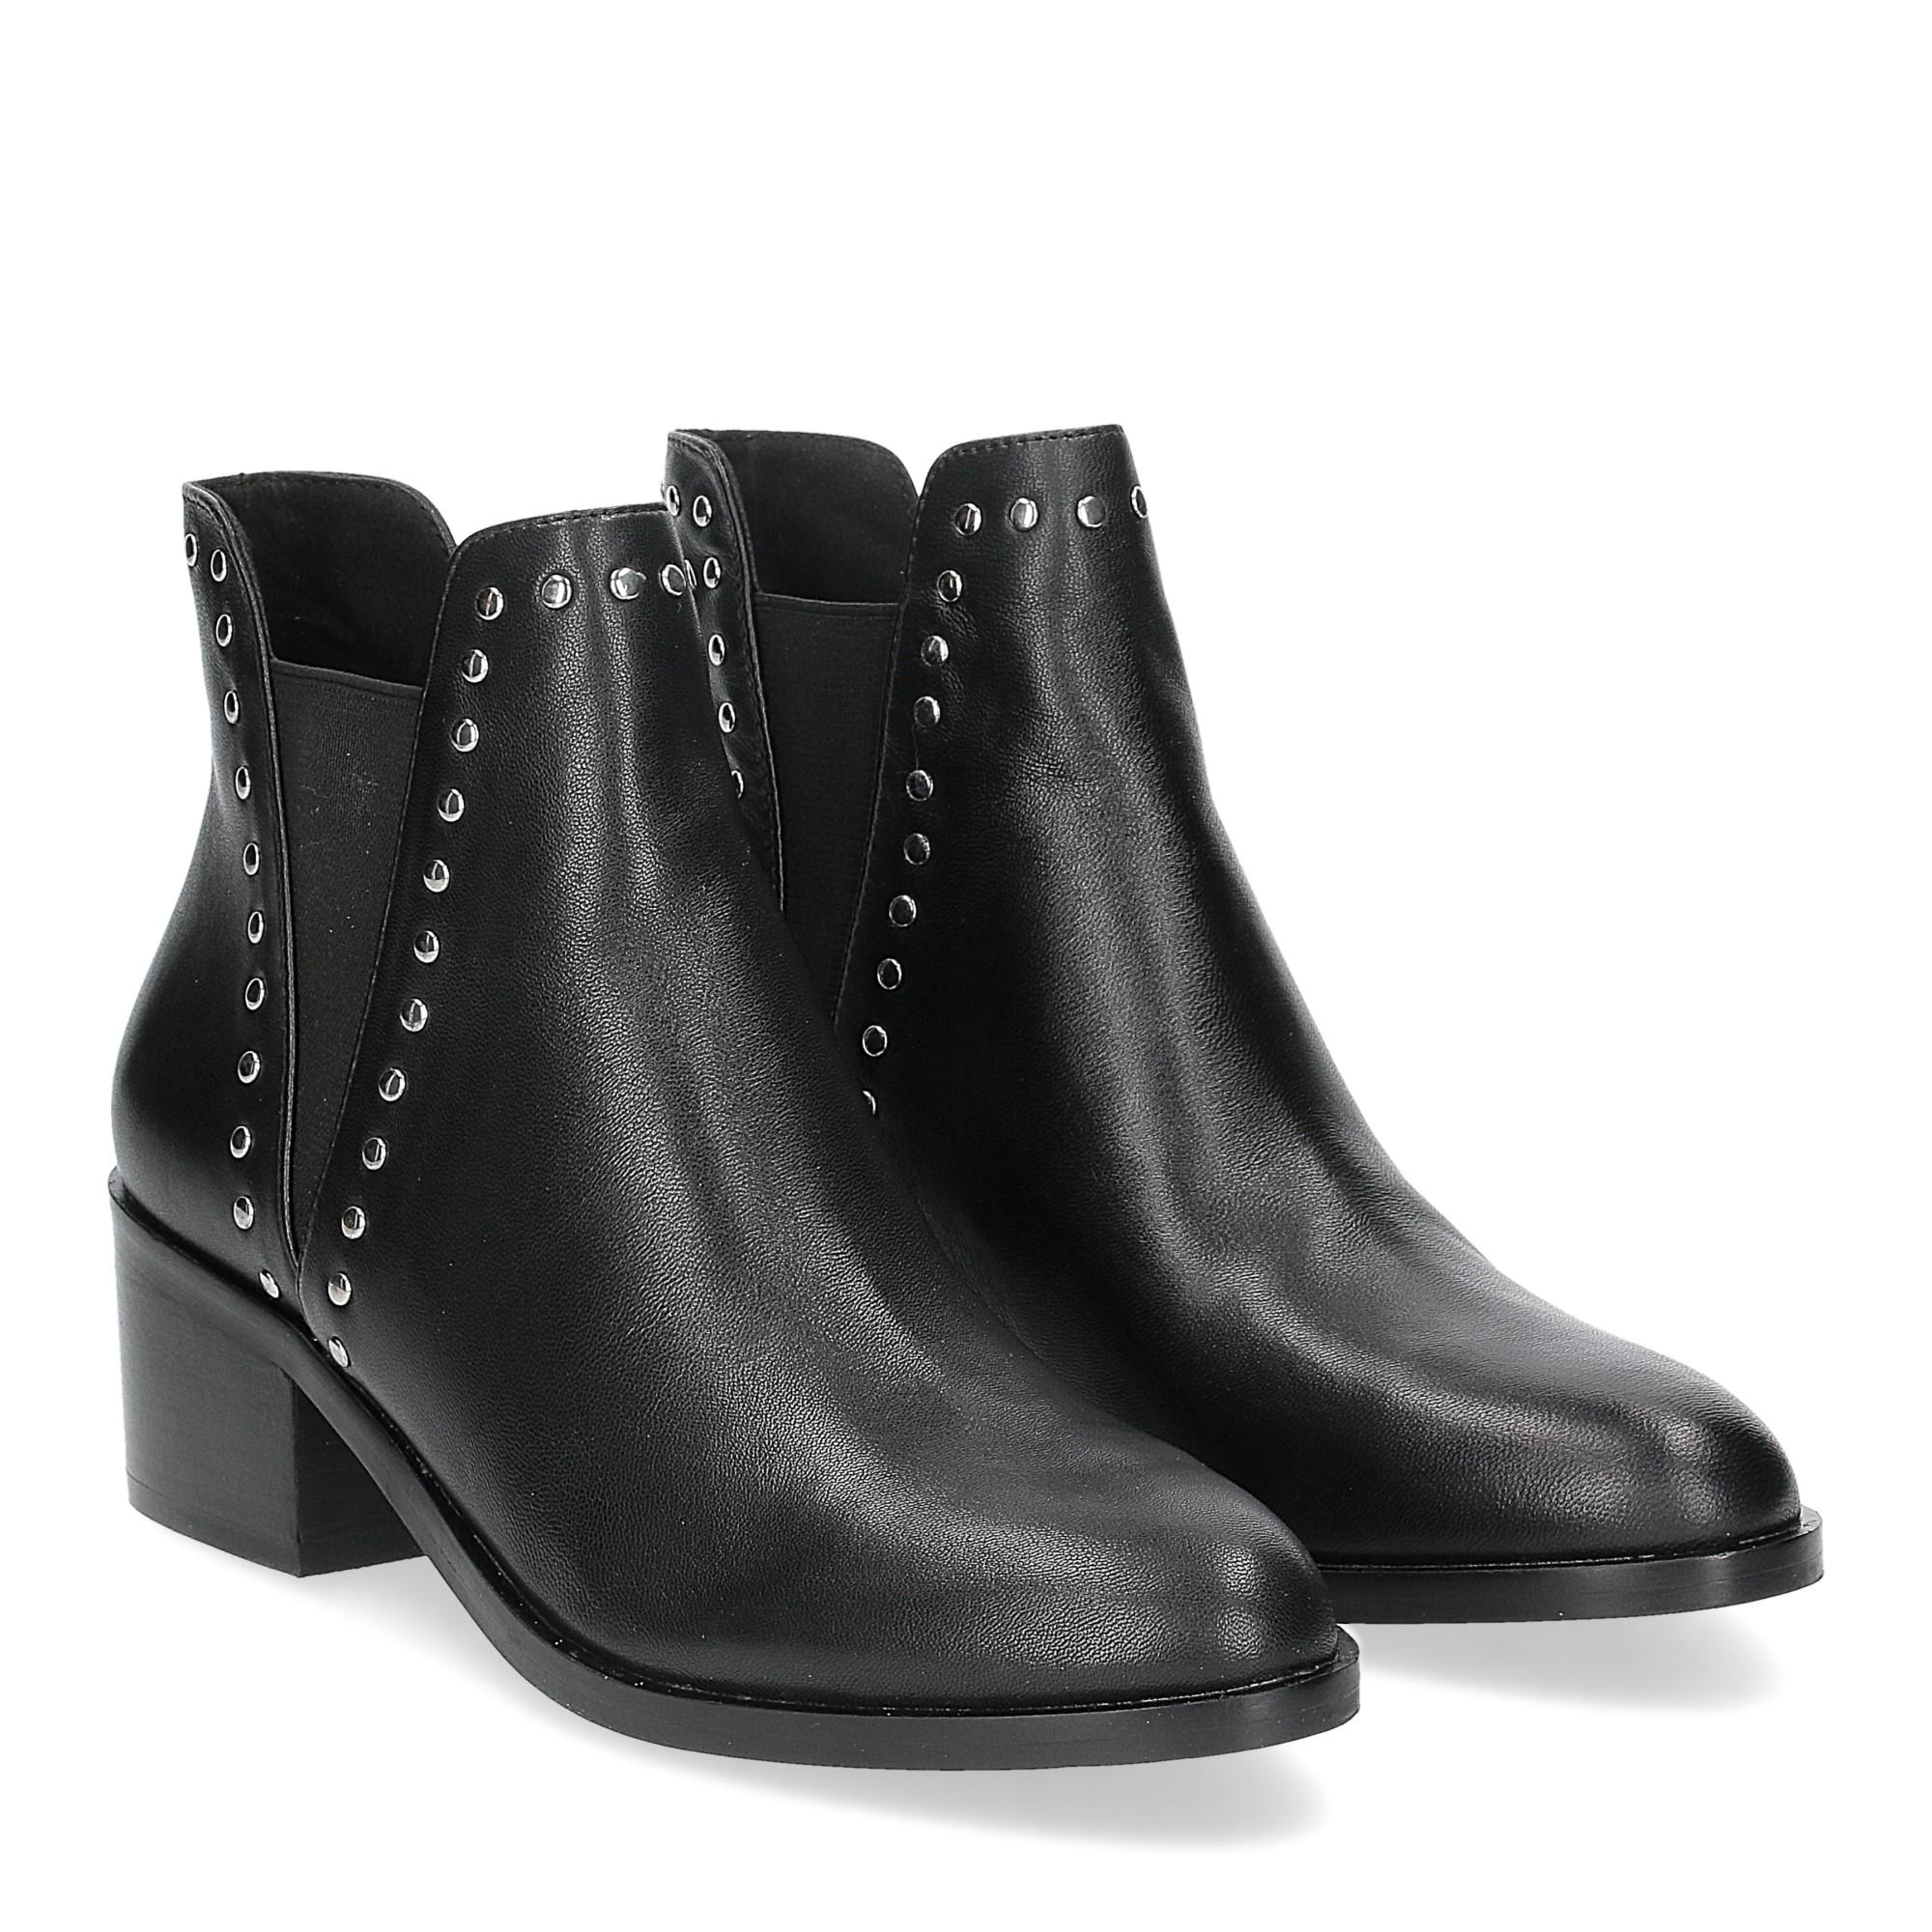 Steve Madden Cade black leather